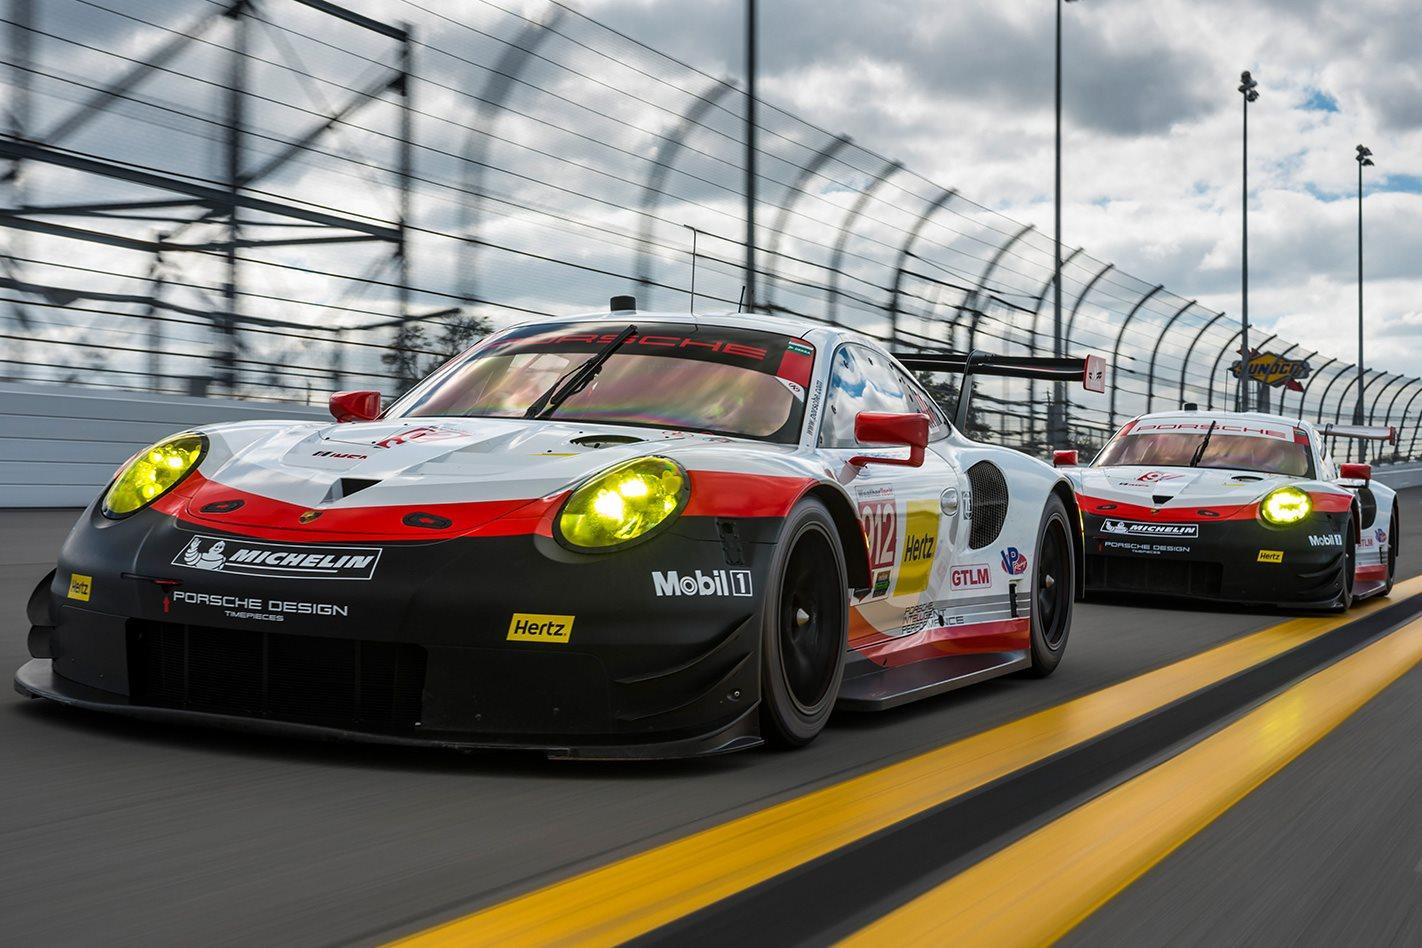 Porsche leaving LMP1 to join Formula E